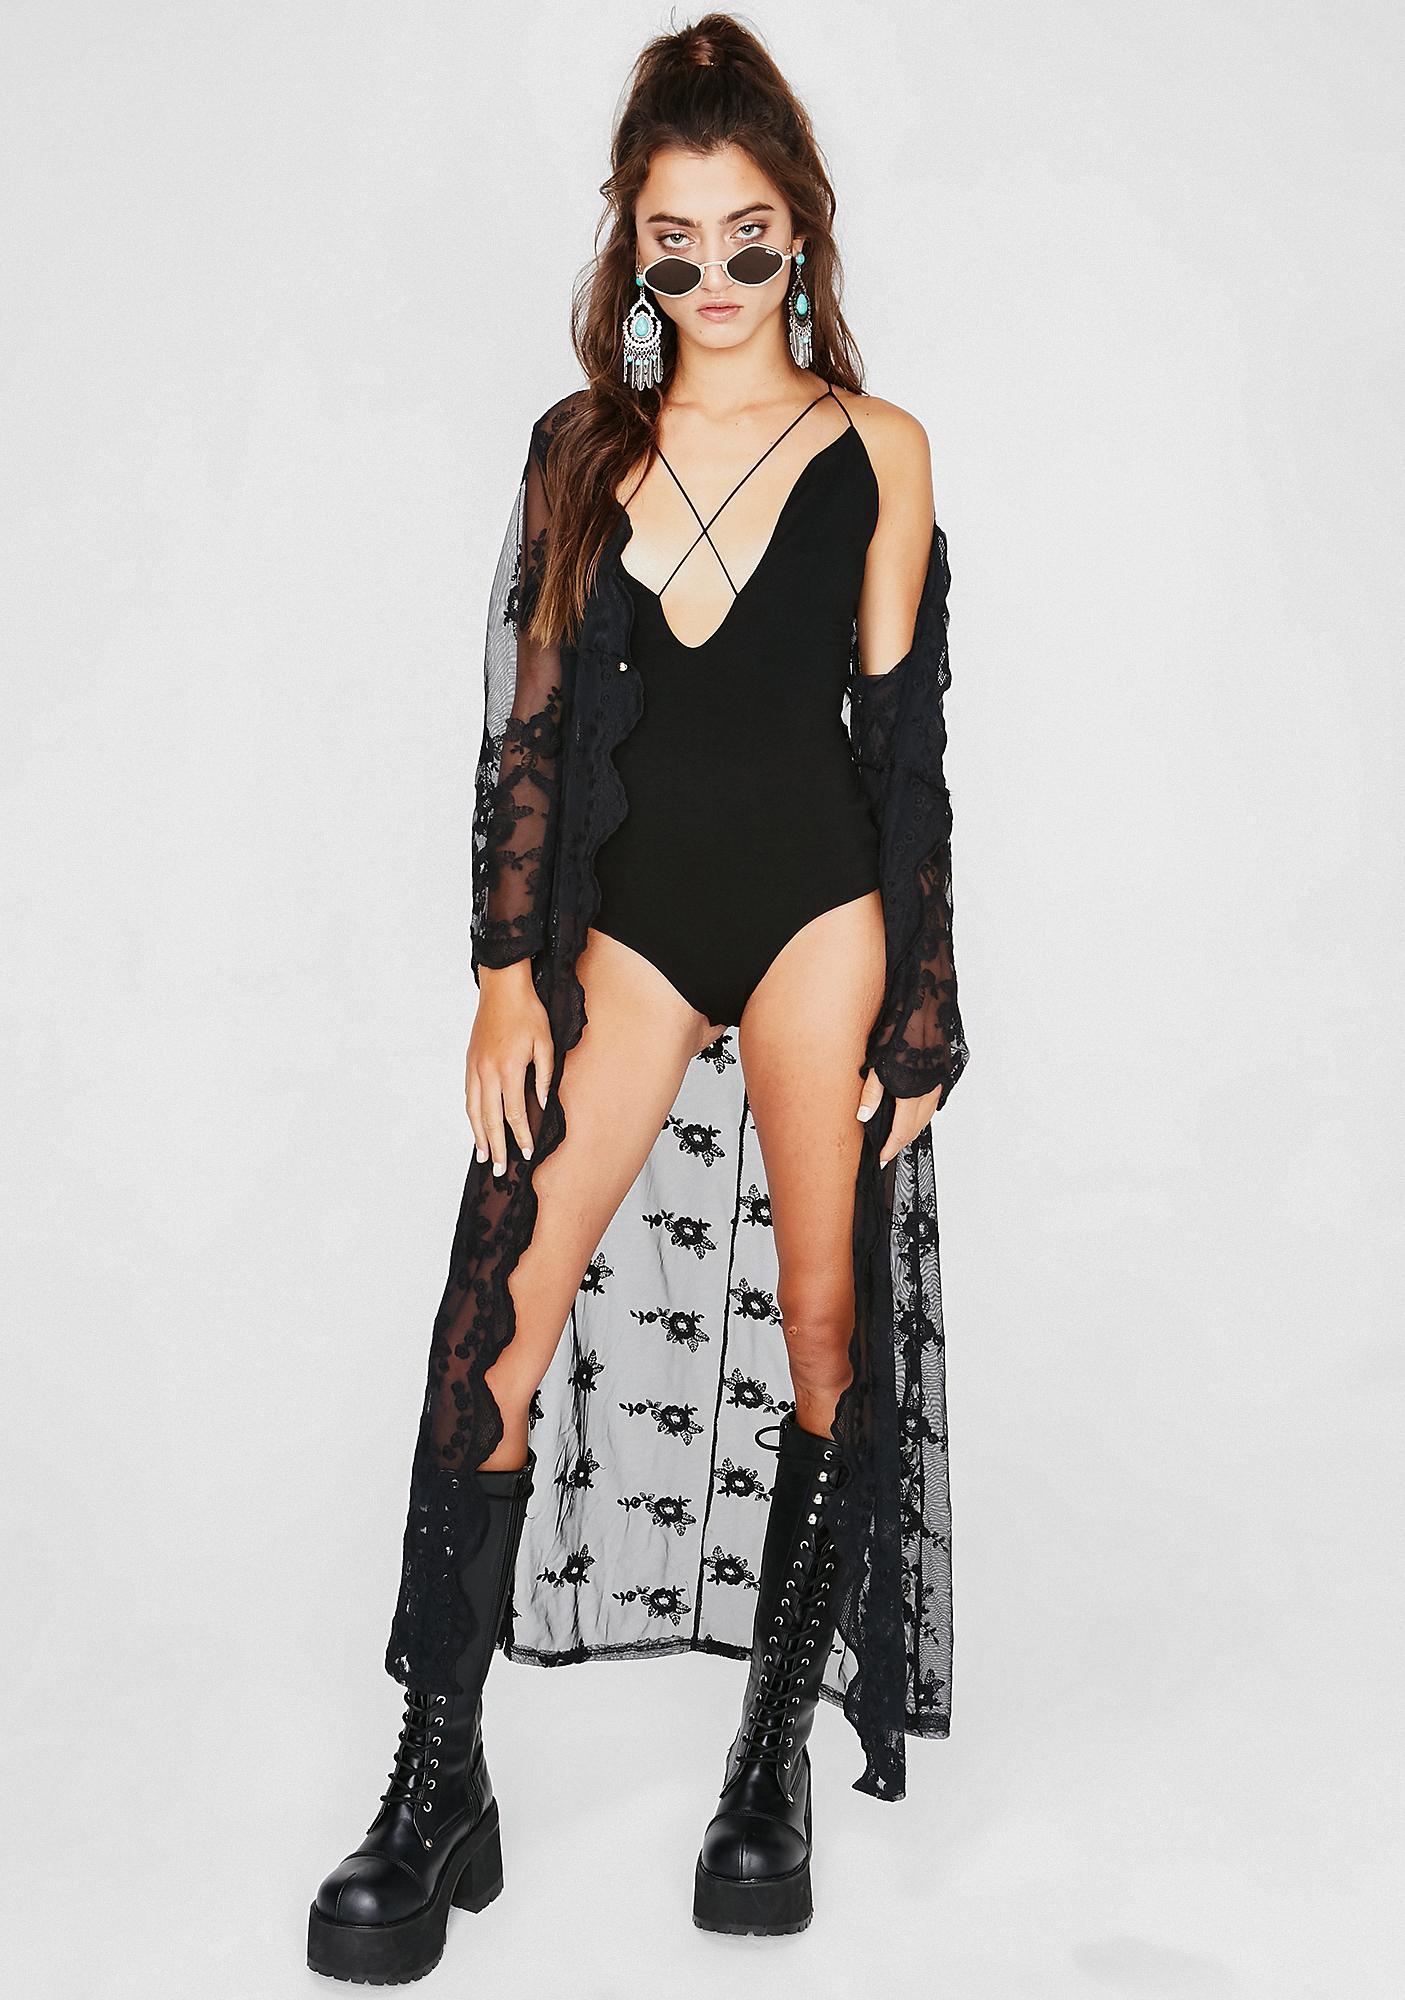 Get It Girl Strappy Bodysuit